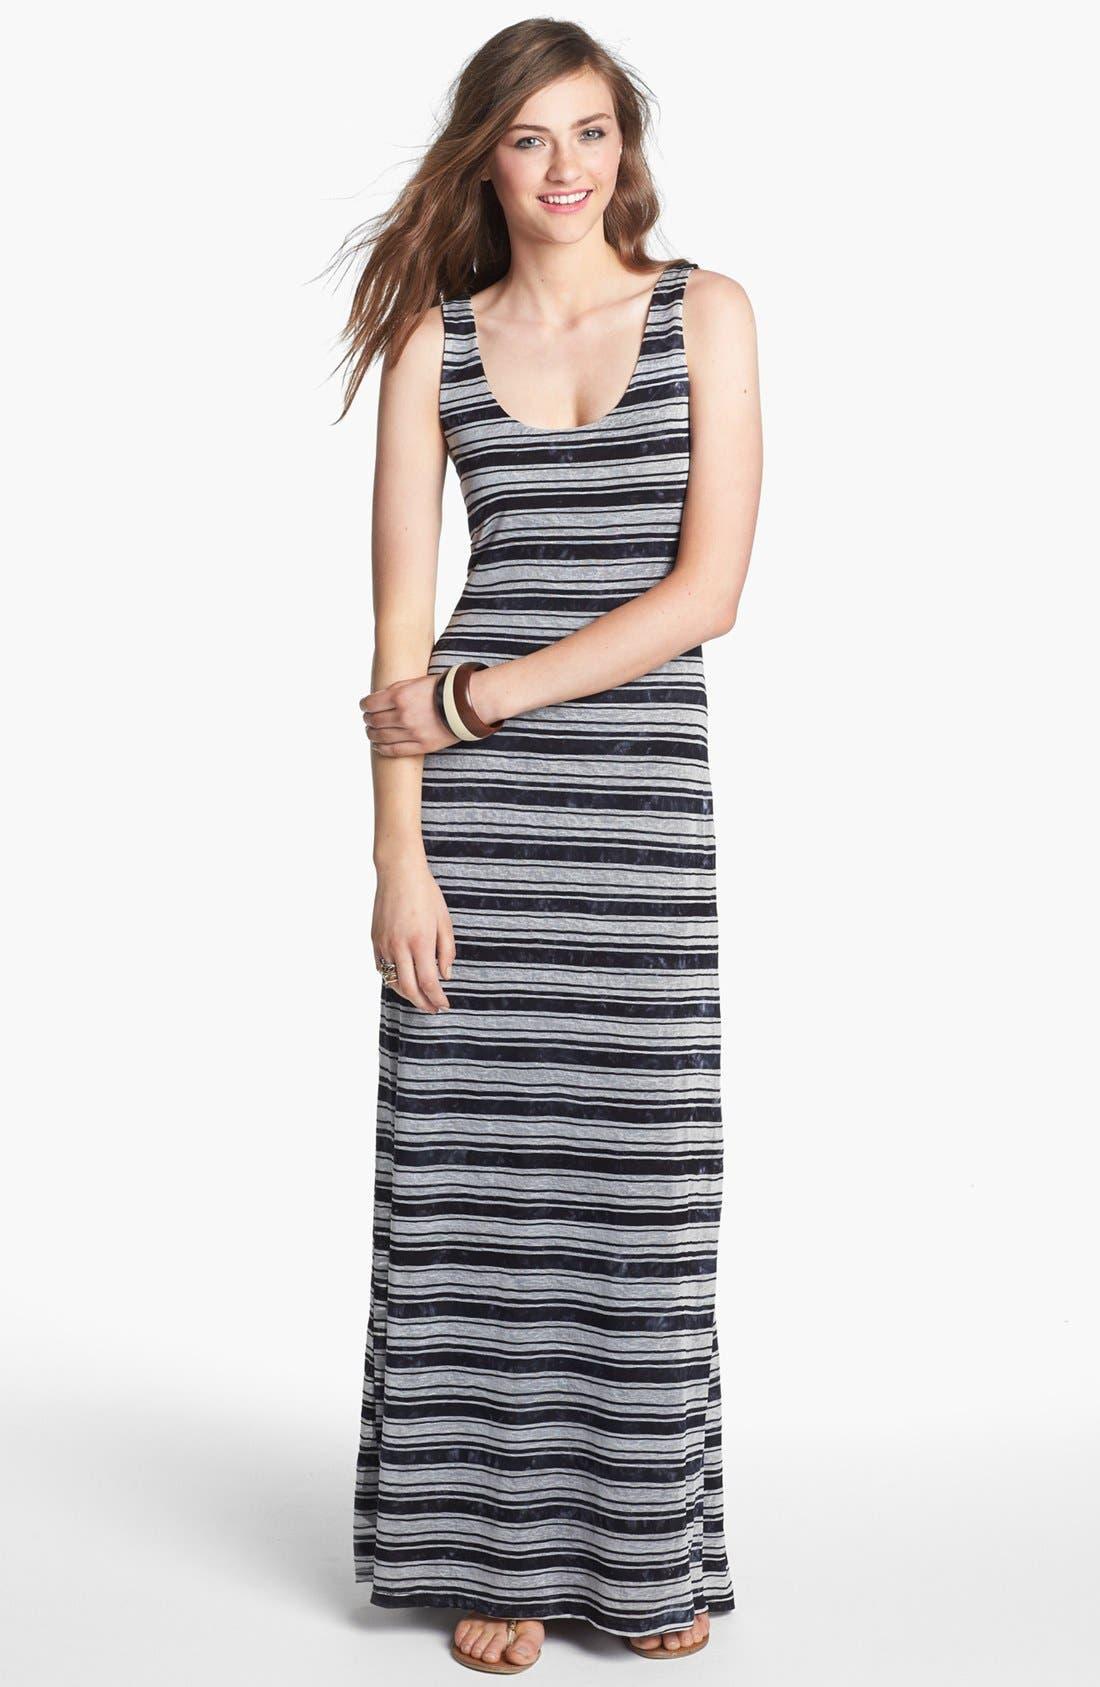 Alternate Image 1 Selected - Socialite Stripe Maxi Dress (Juniors) (Online Only)